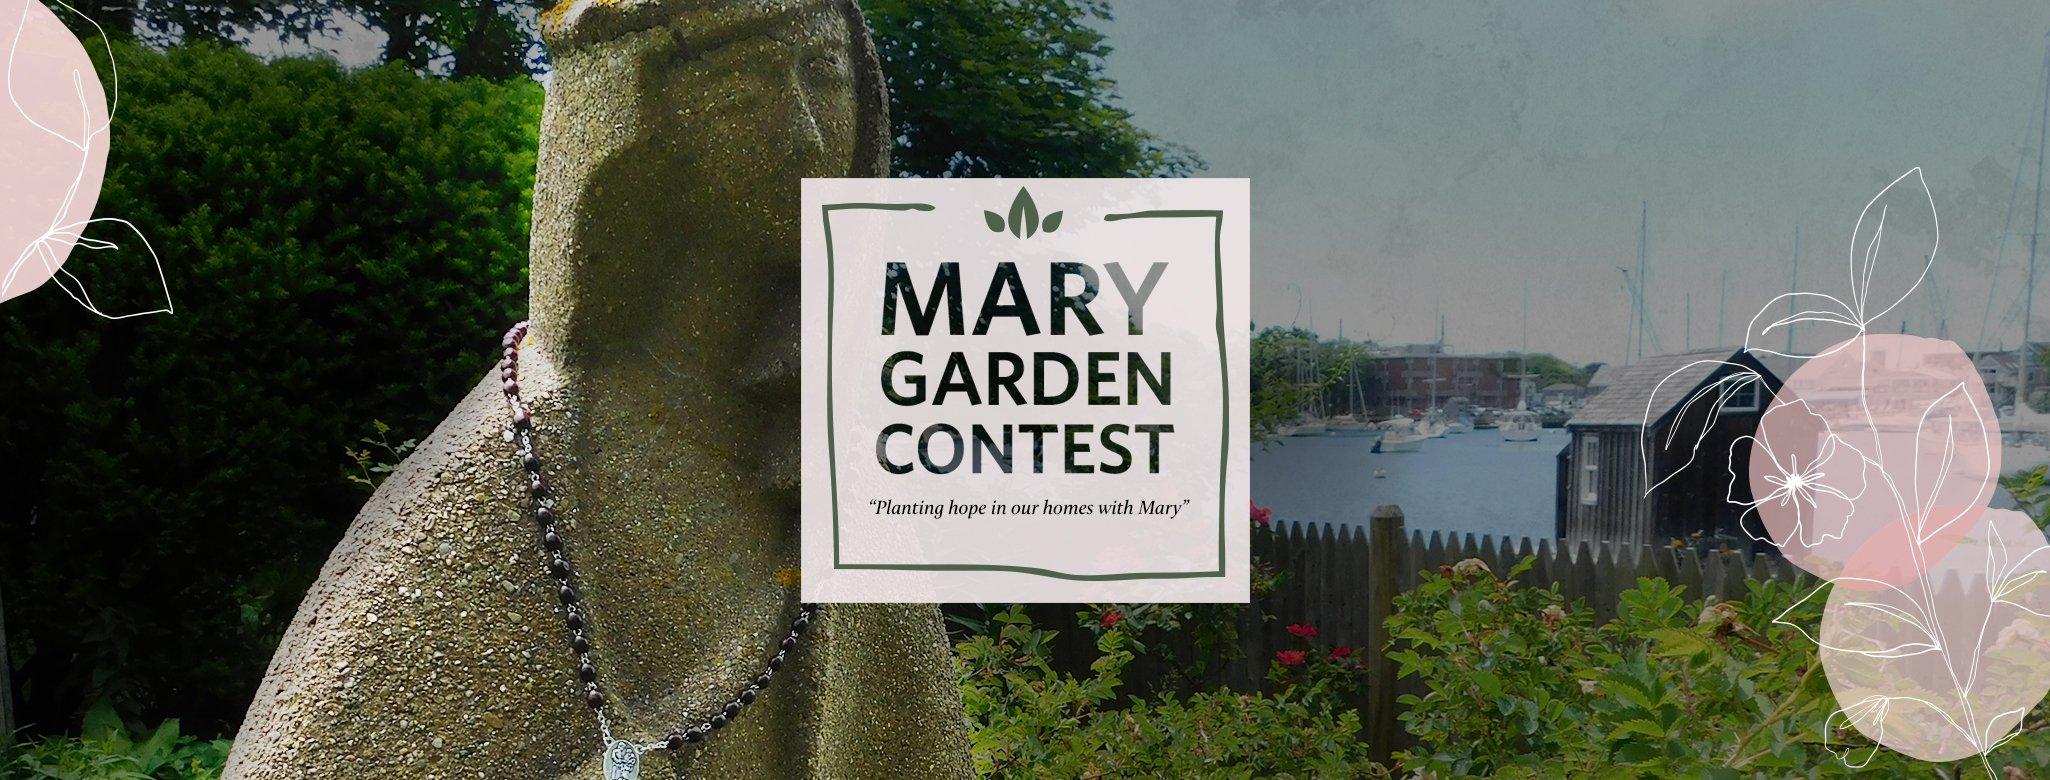 Mary Garden_Hero_2050x780_rev